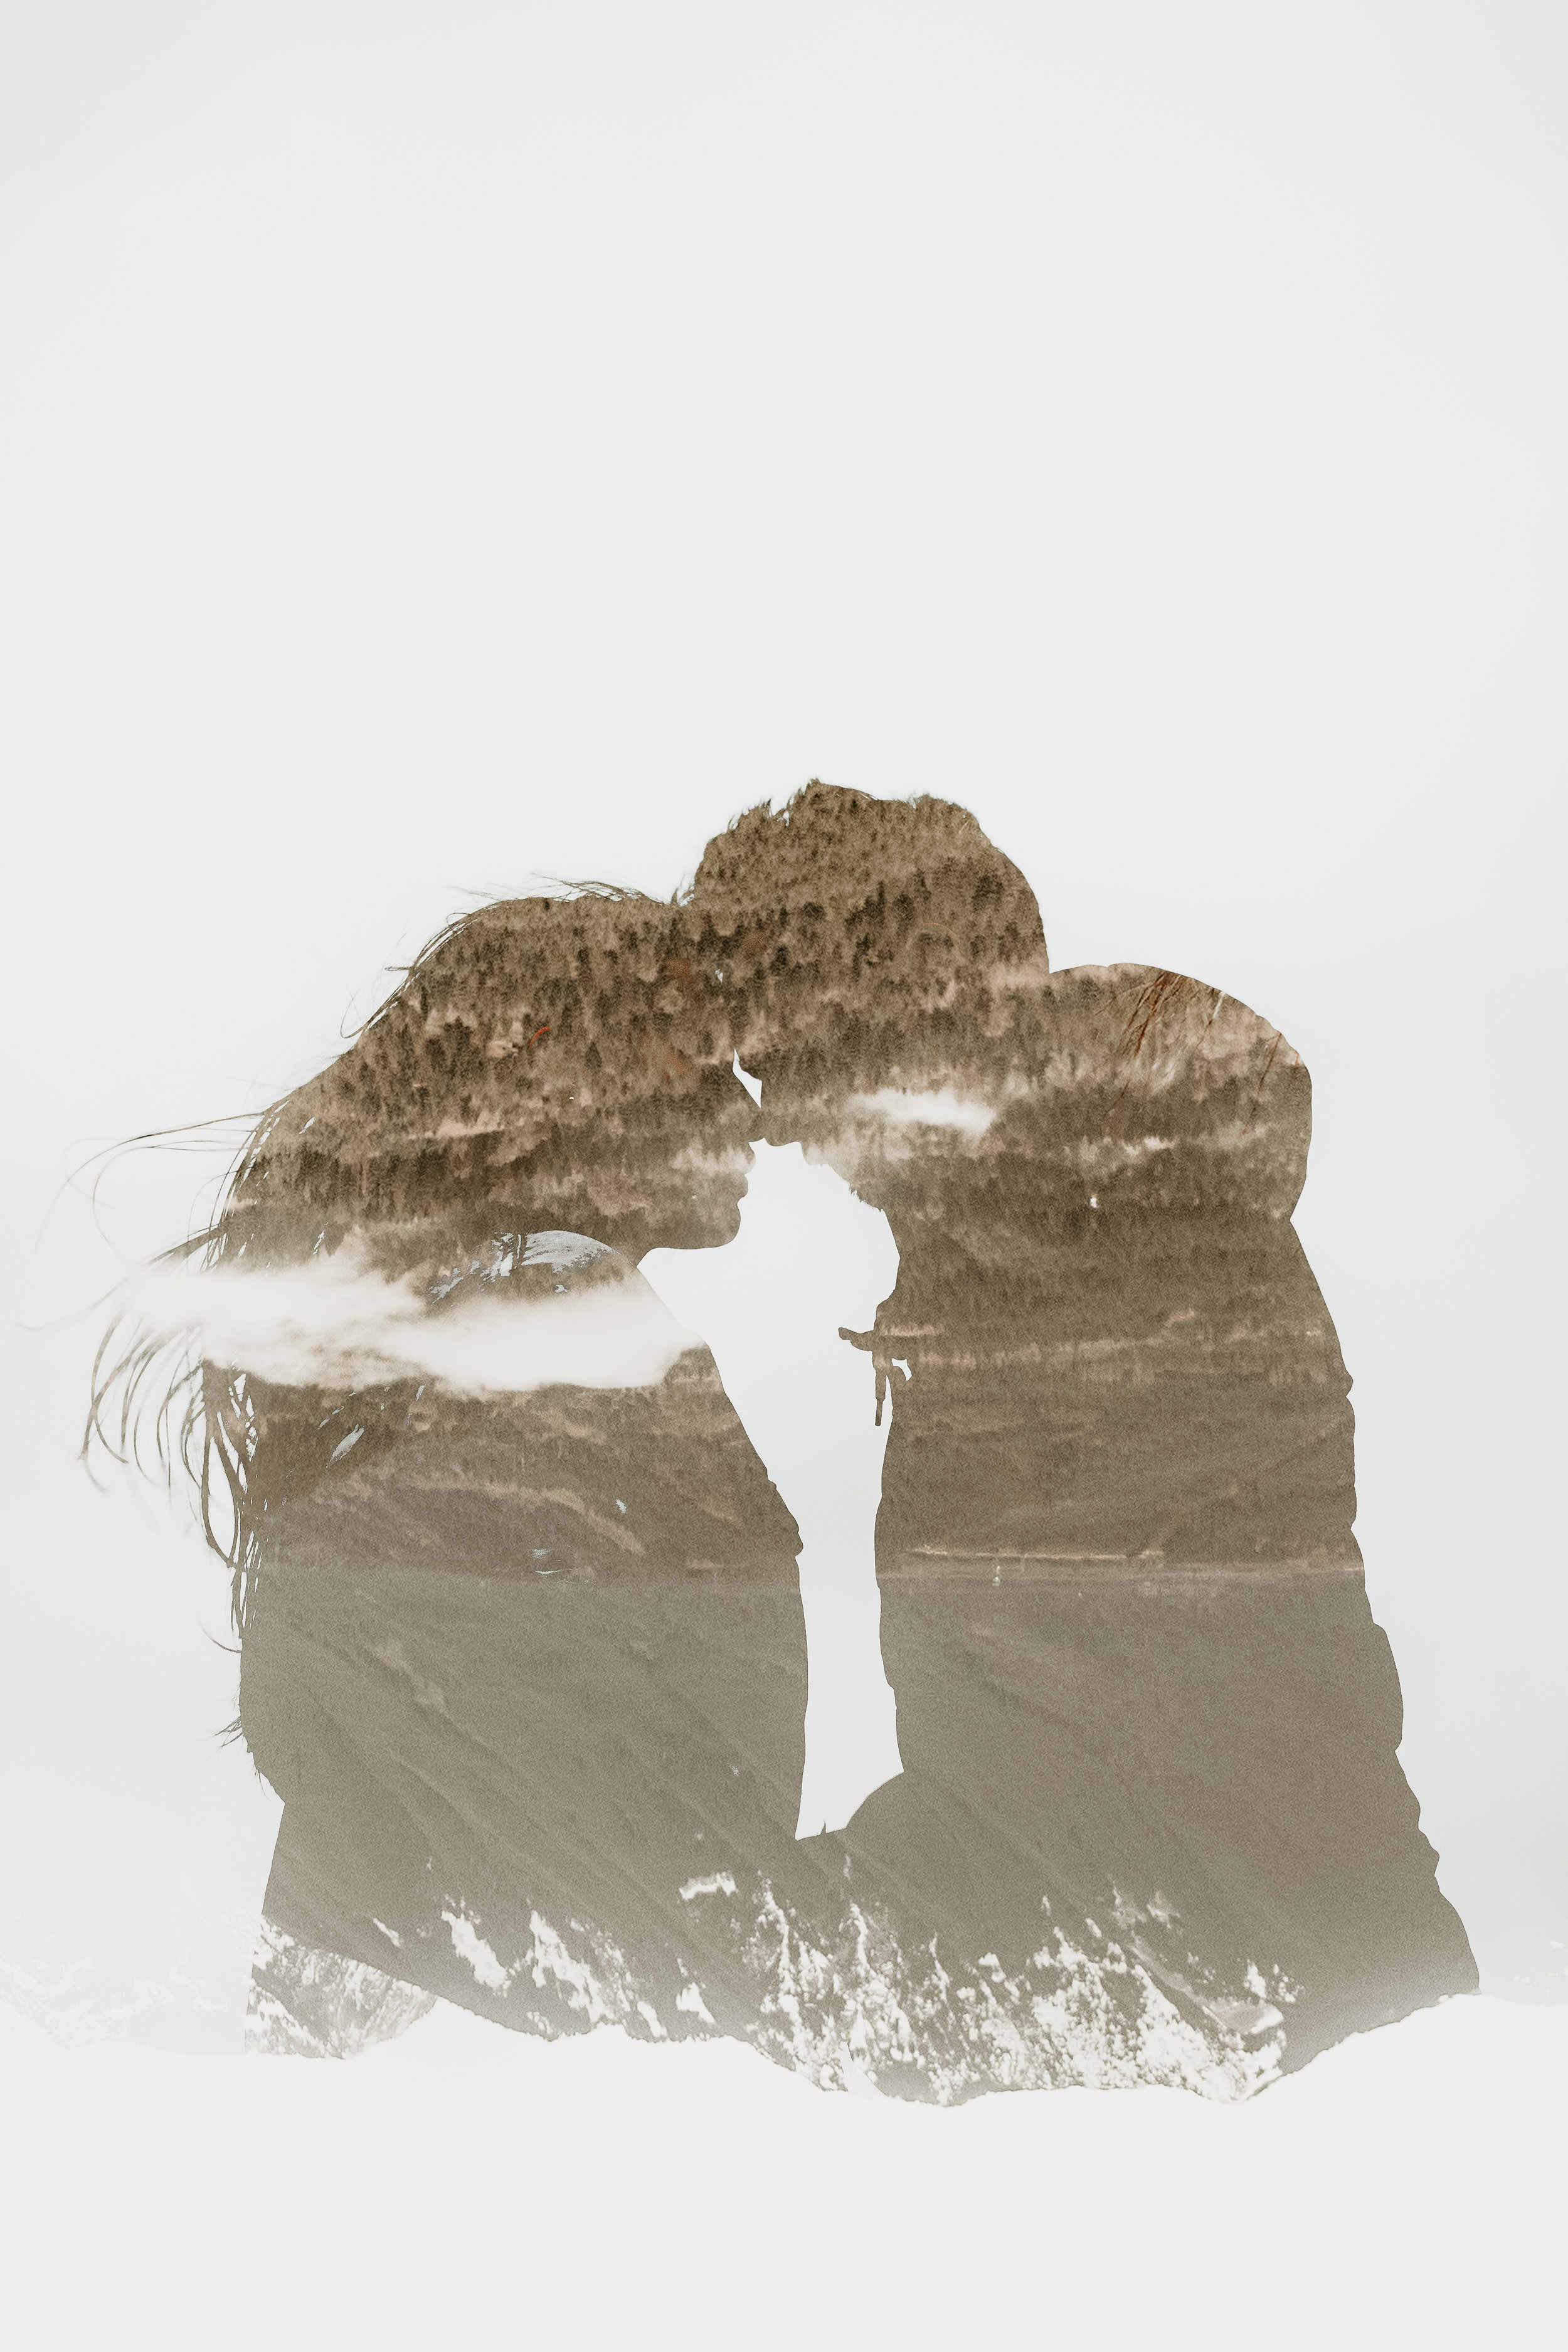 Rattlesnak-ridge-engagement-session-photography-breeanna-lasher-2.jpg